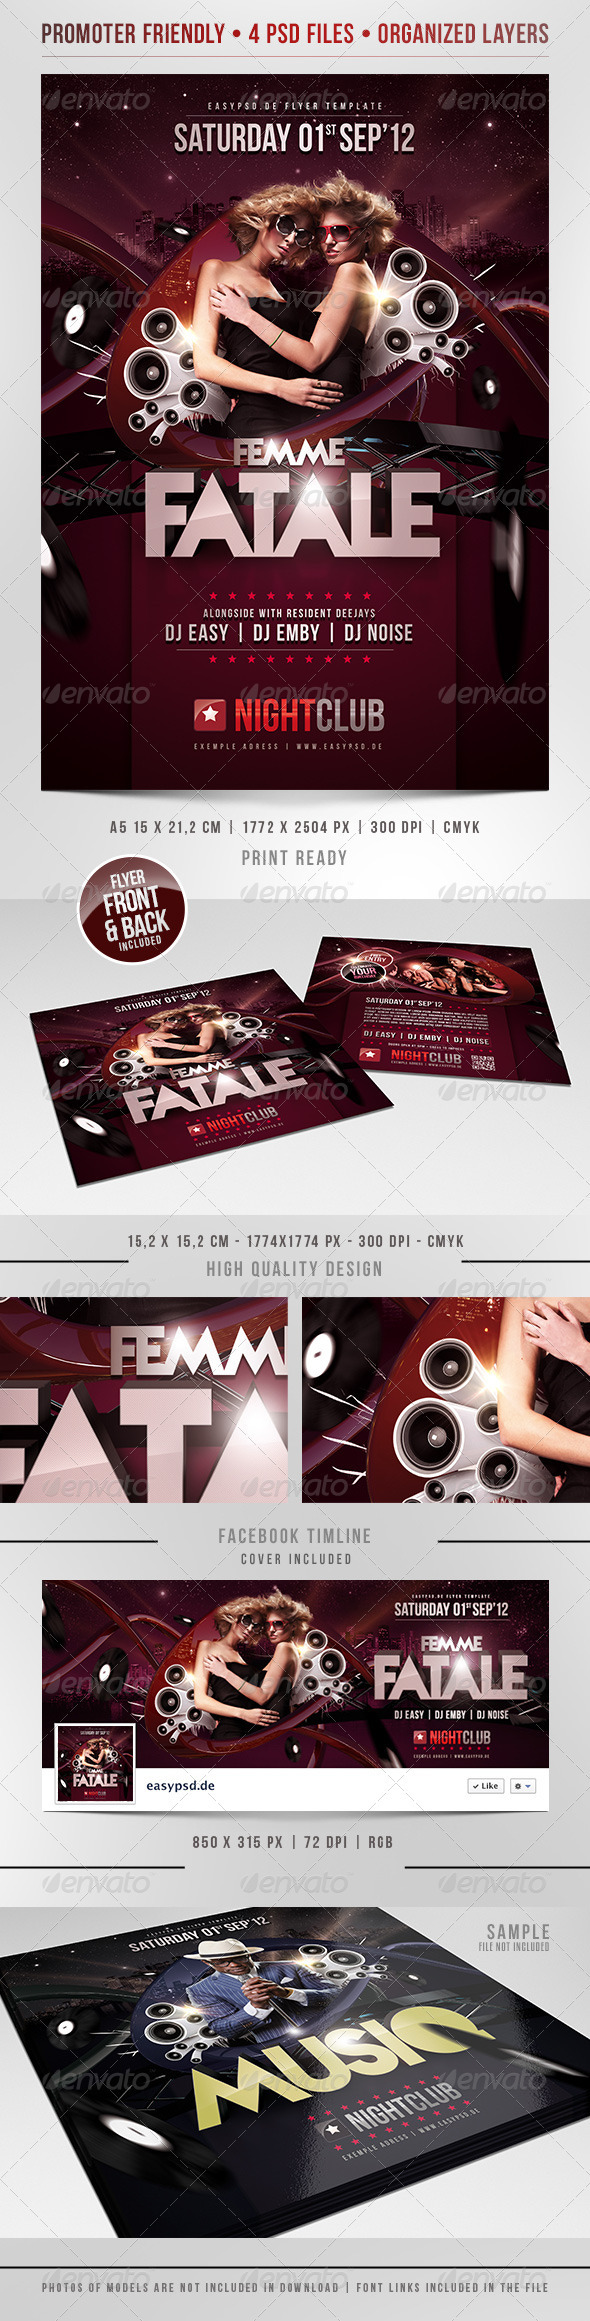 GraphicRiver Femme Fatale Flyer Template 2819730